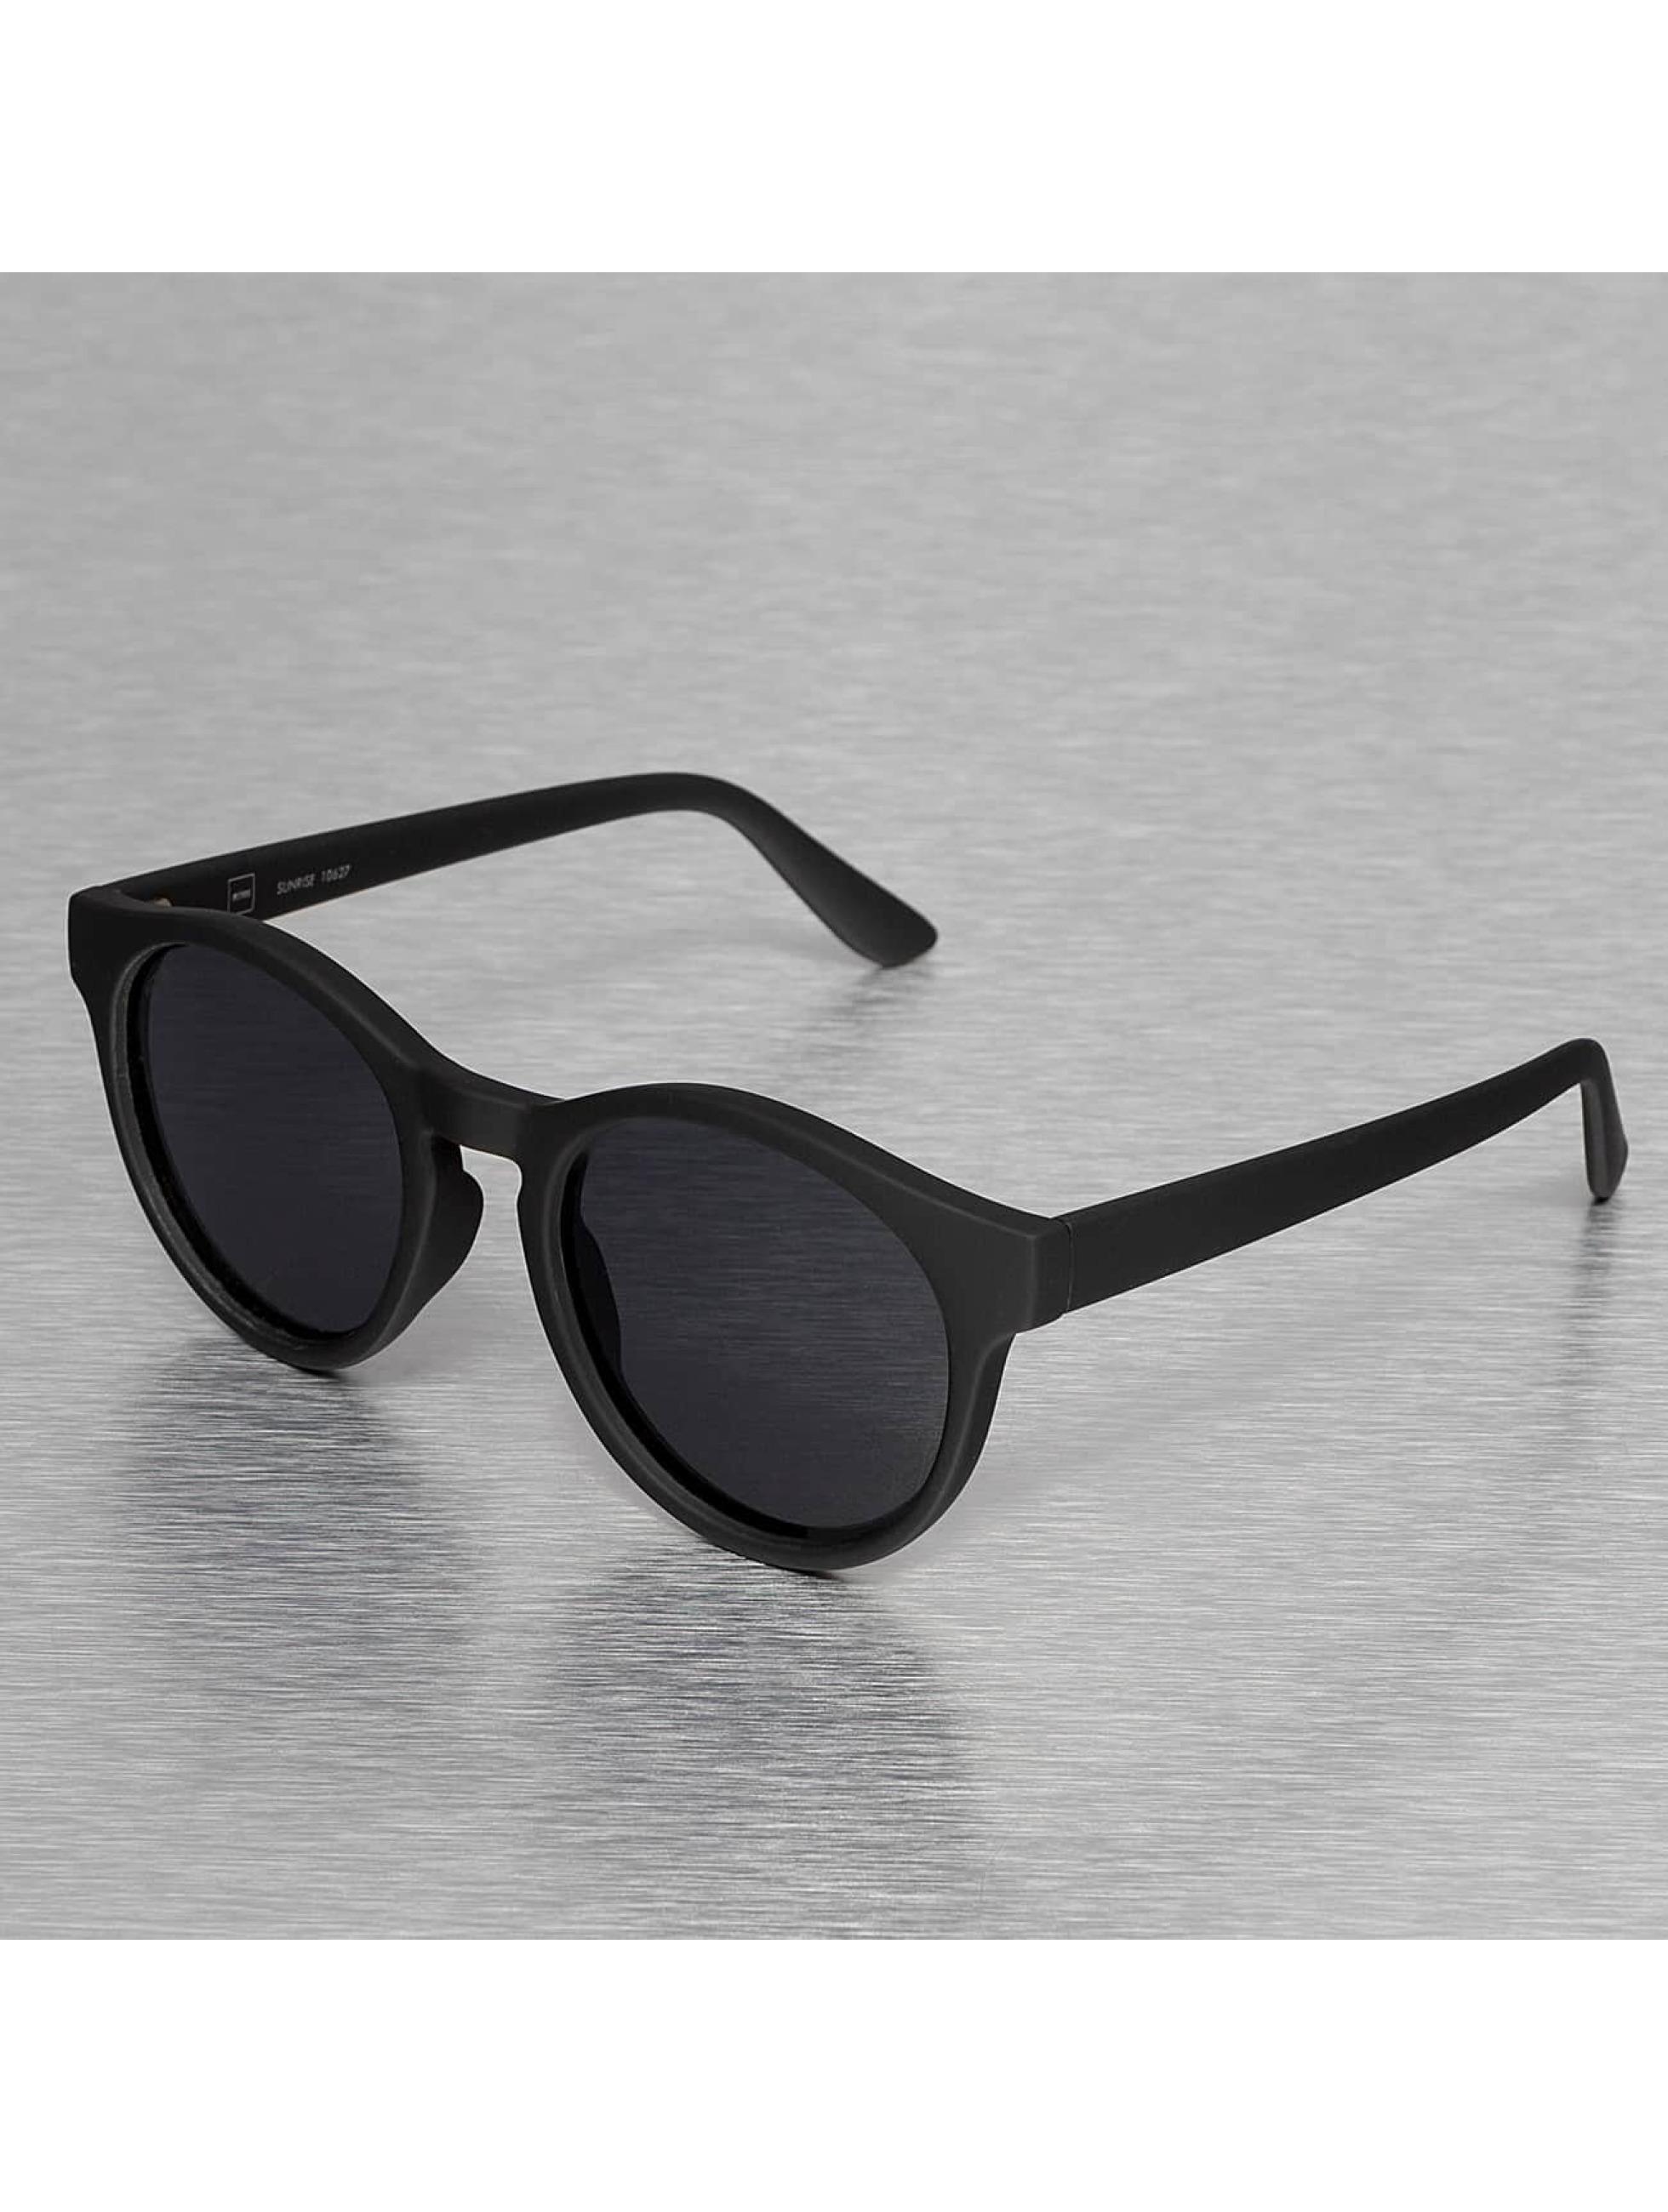 MSTRDS Männer,Frauen Sonnenbrille Sunrise Polarized in schwarz